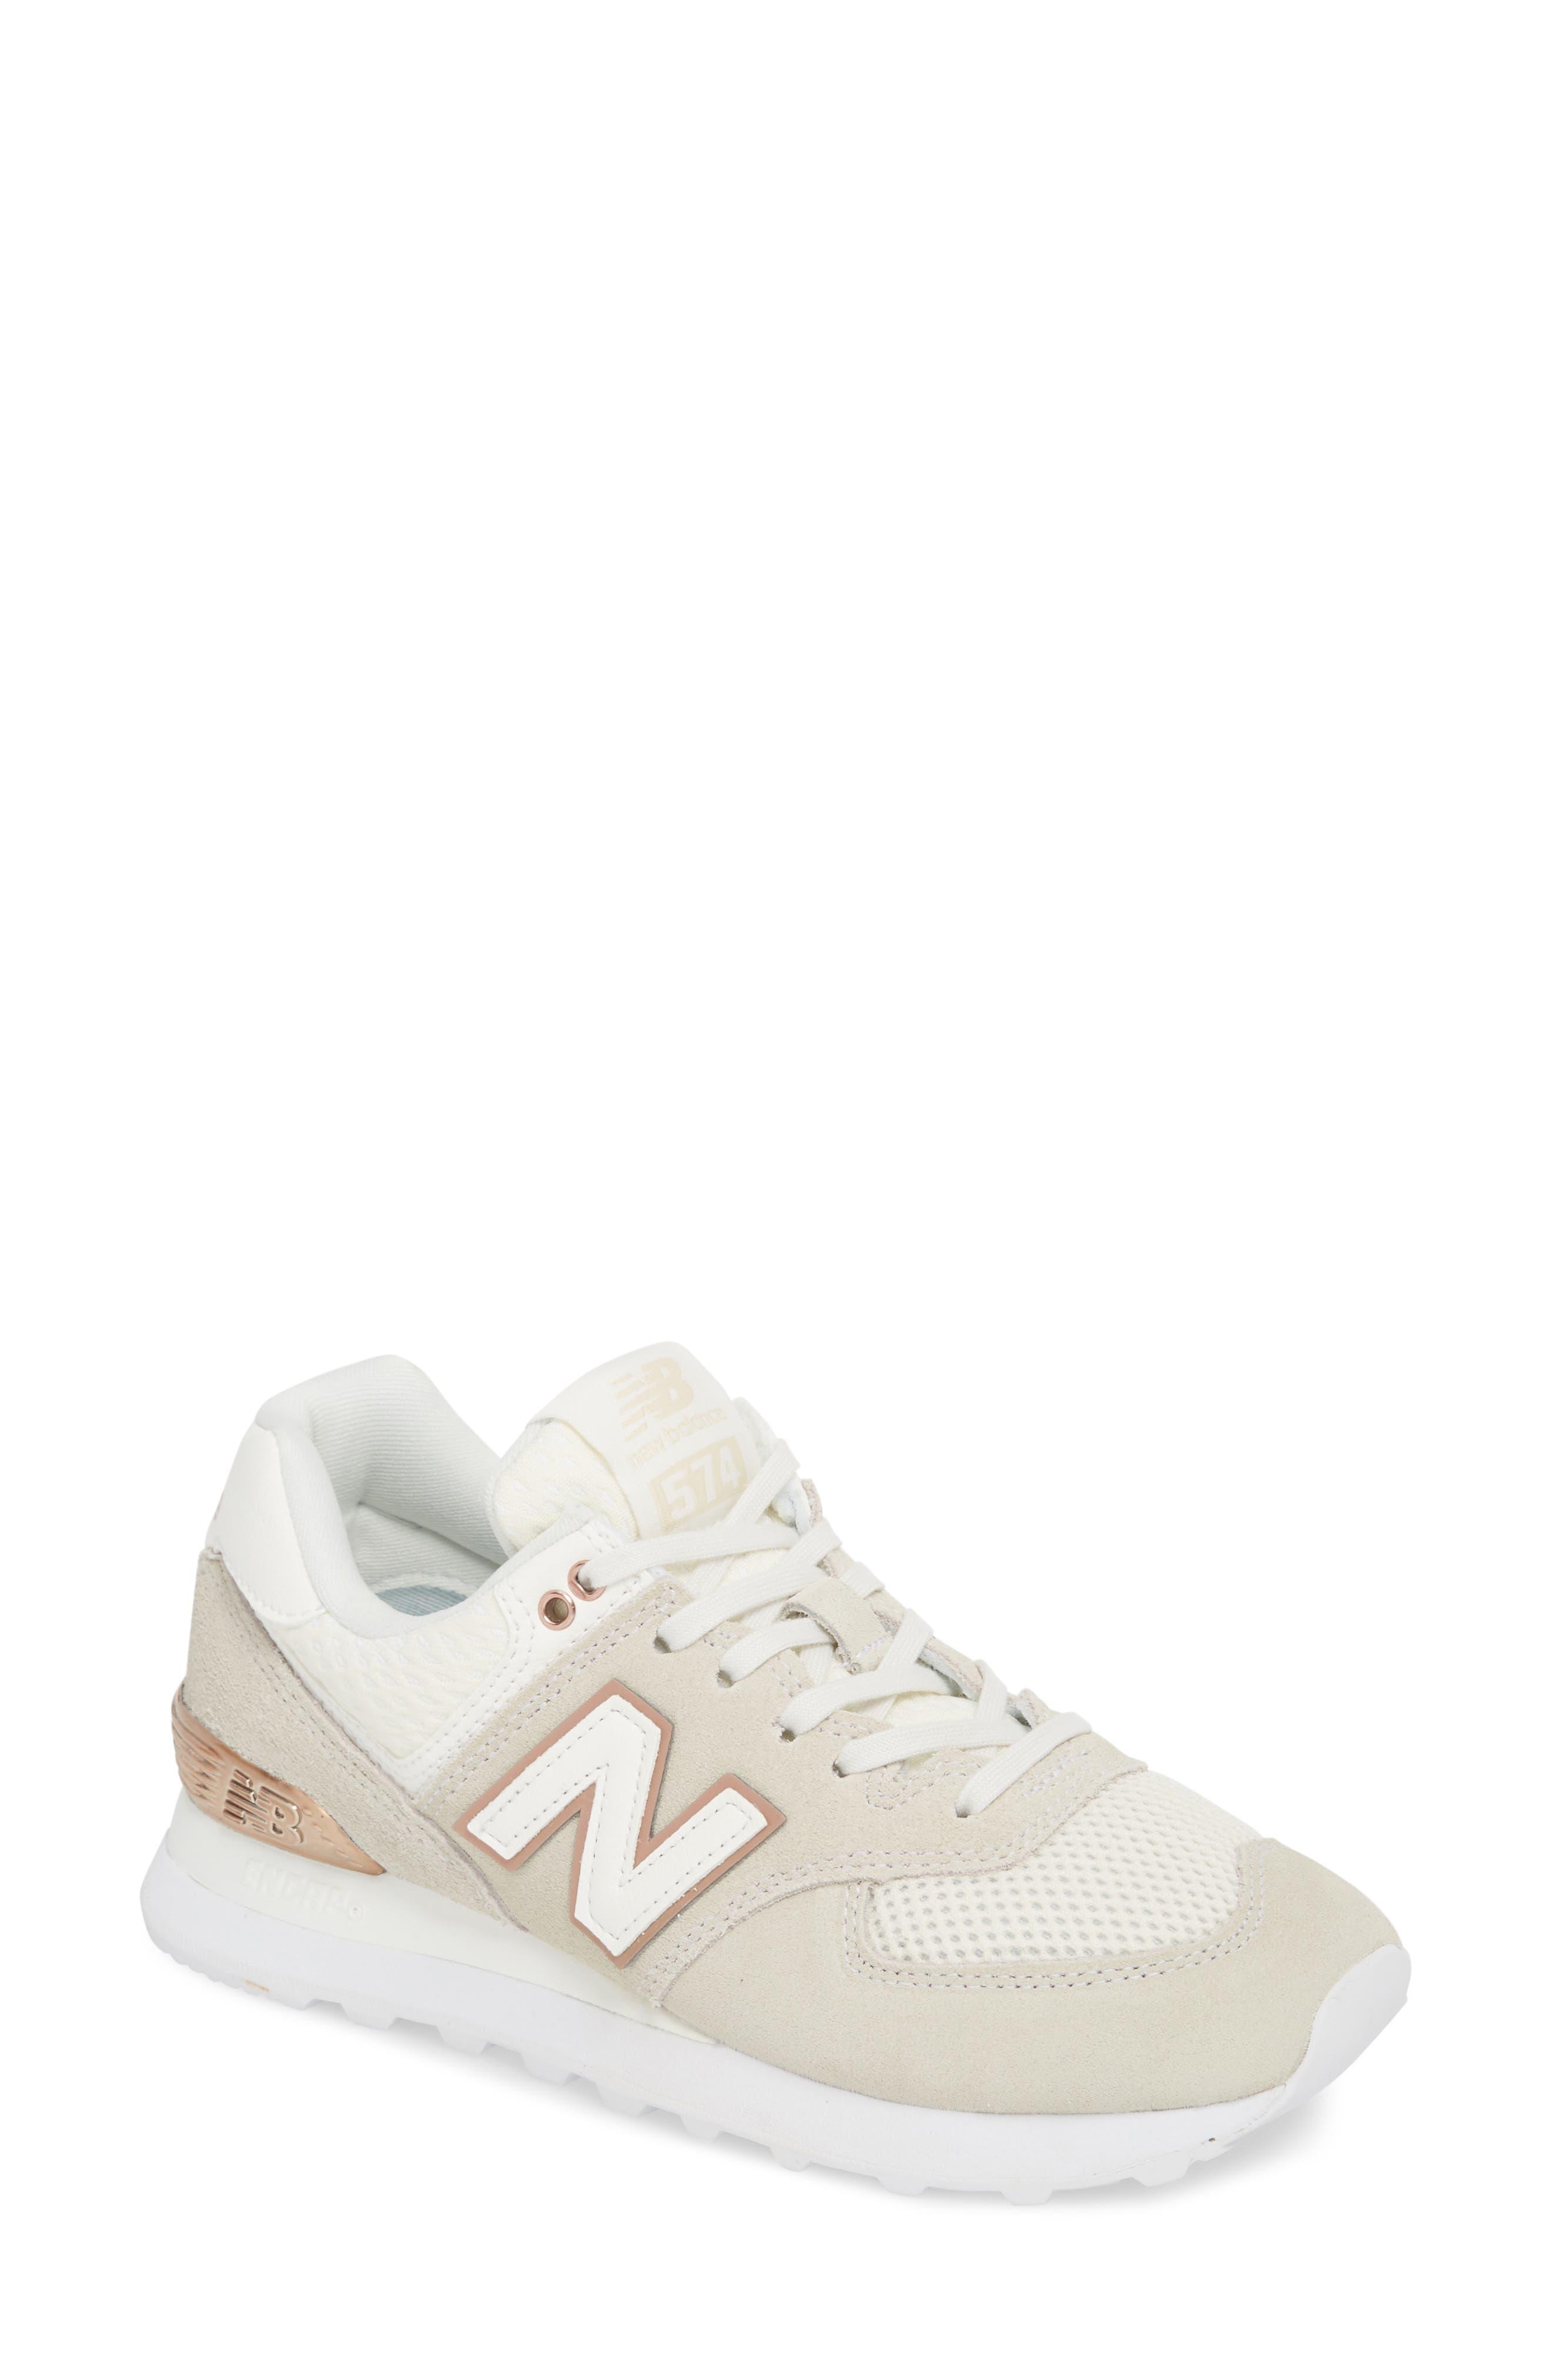 574 Sneaker,                             Main thumbnail 1, color,